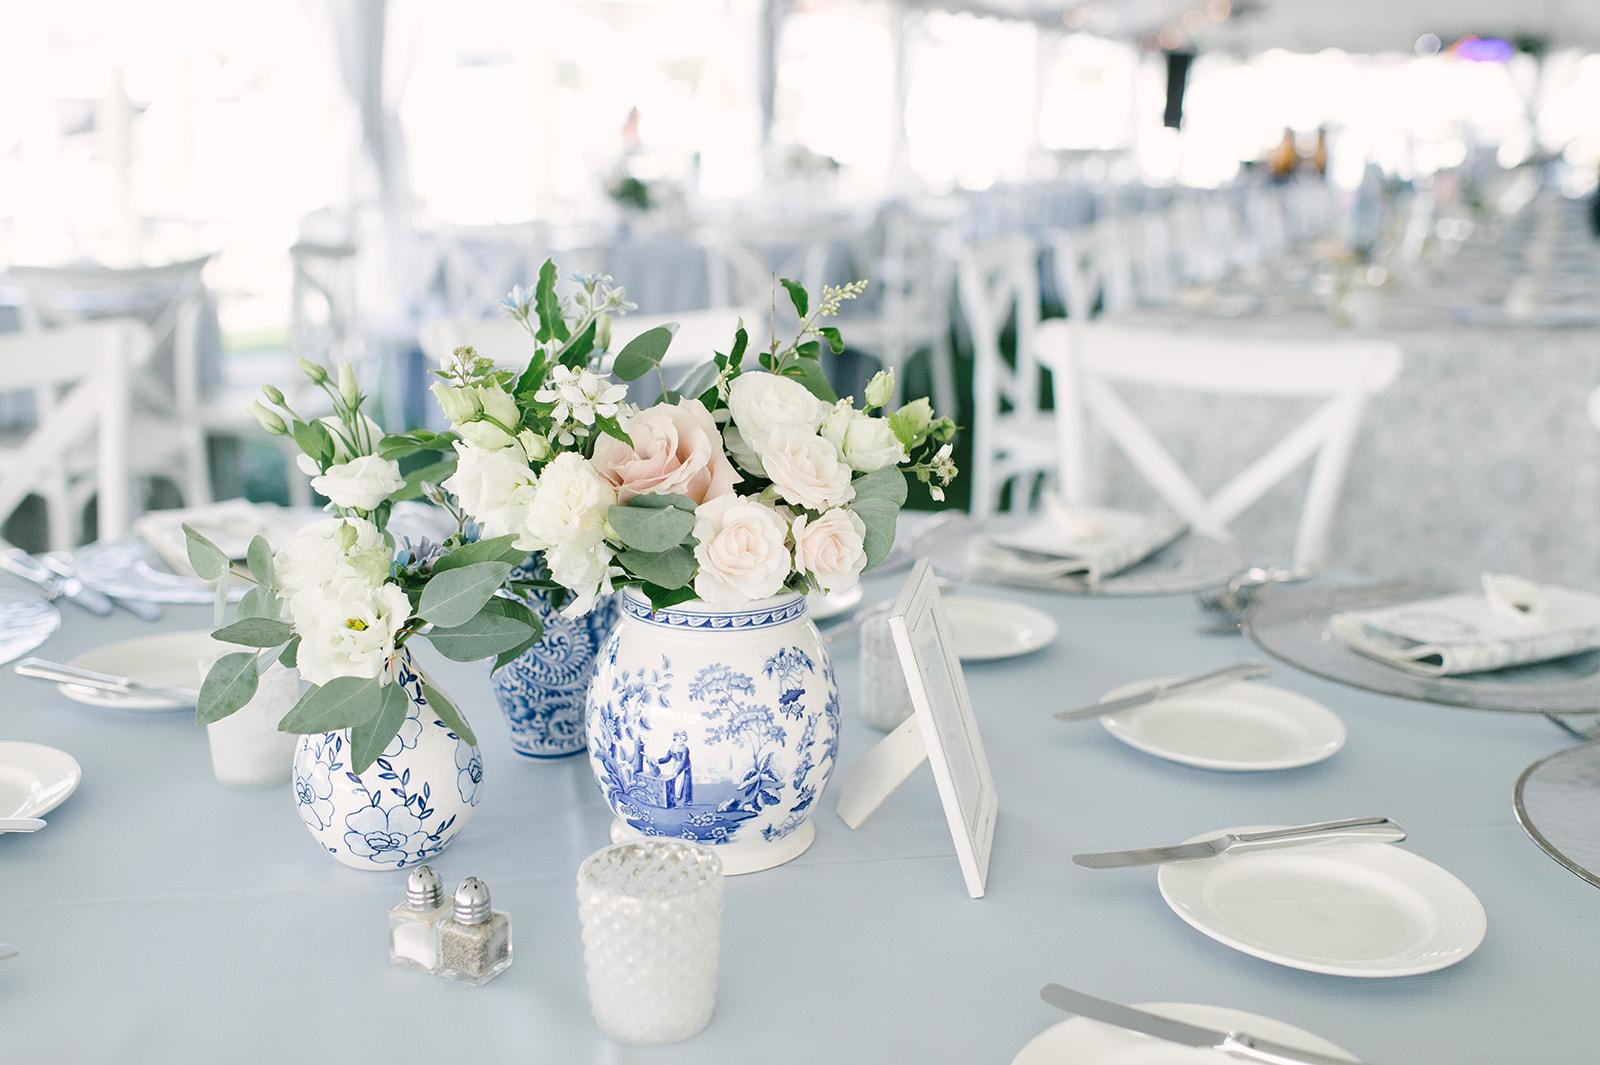 reception-boland-sarah-street-photography-44.jpgCourtney Inghram Cavalier Virginia Beach Wedding Florist Southern and Coastal Wedding